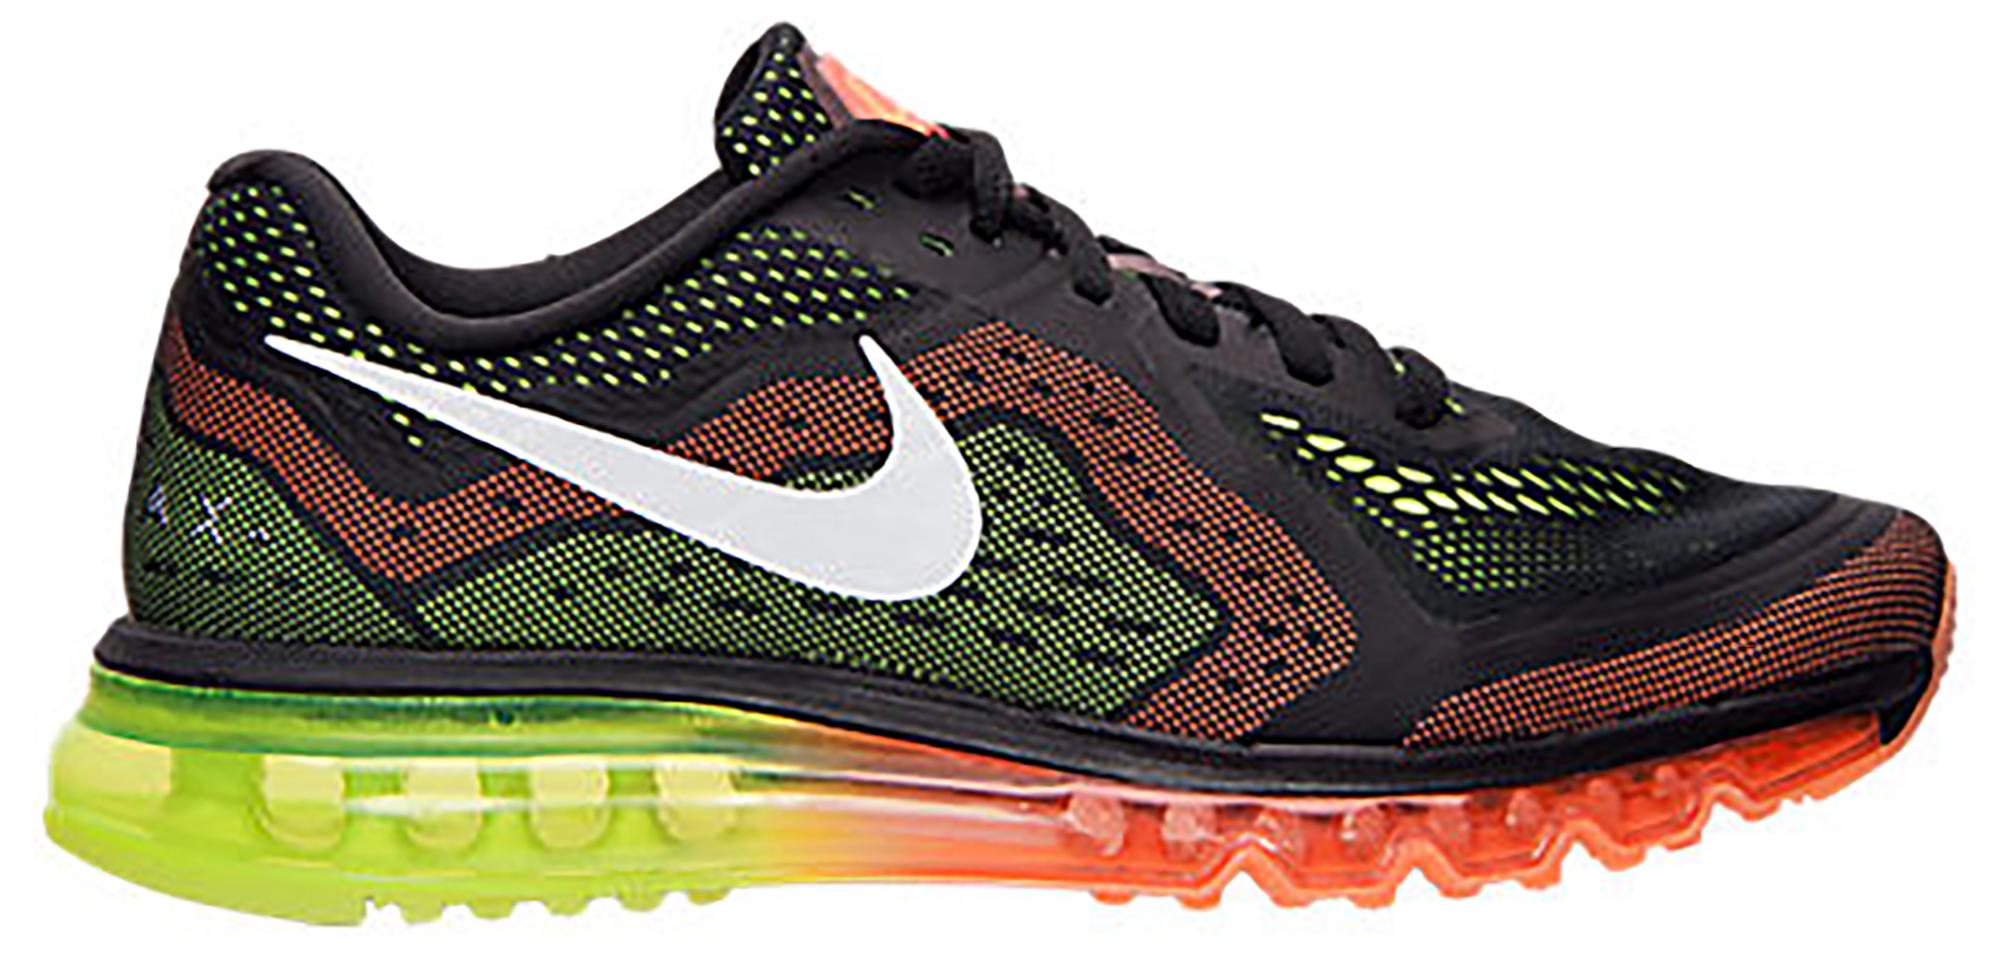 Nike Air Max 2014 Black Orange Volt